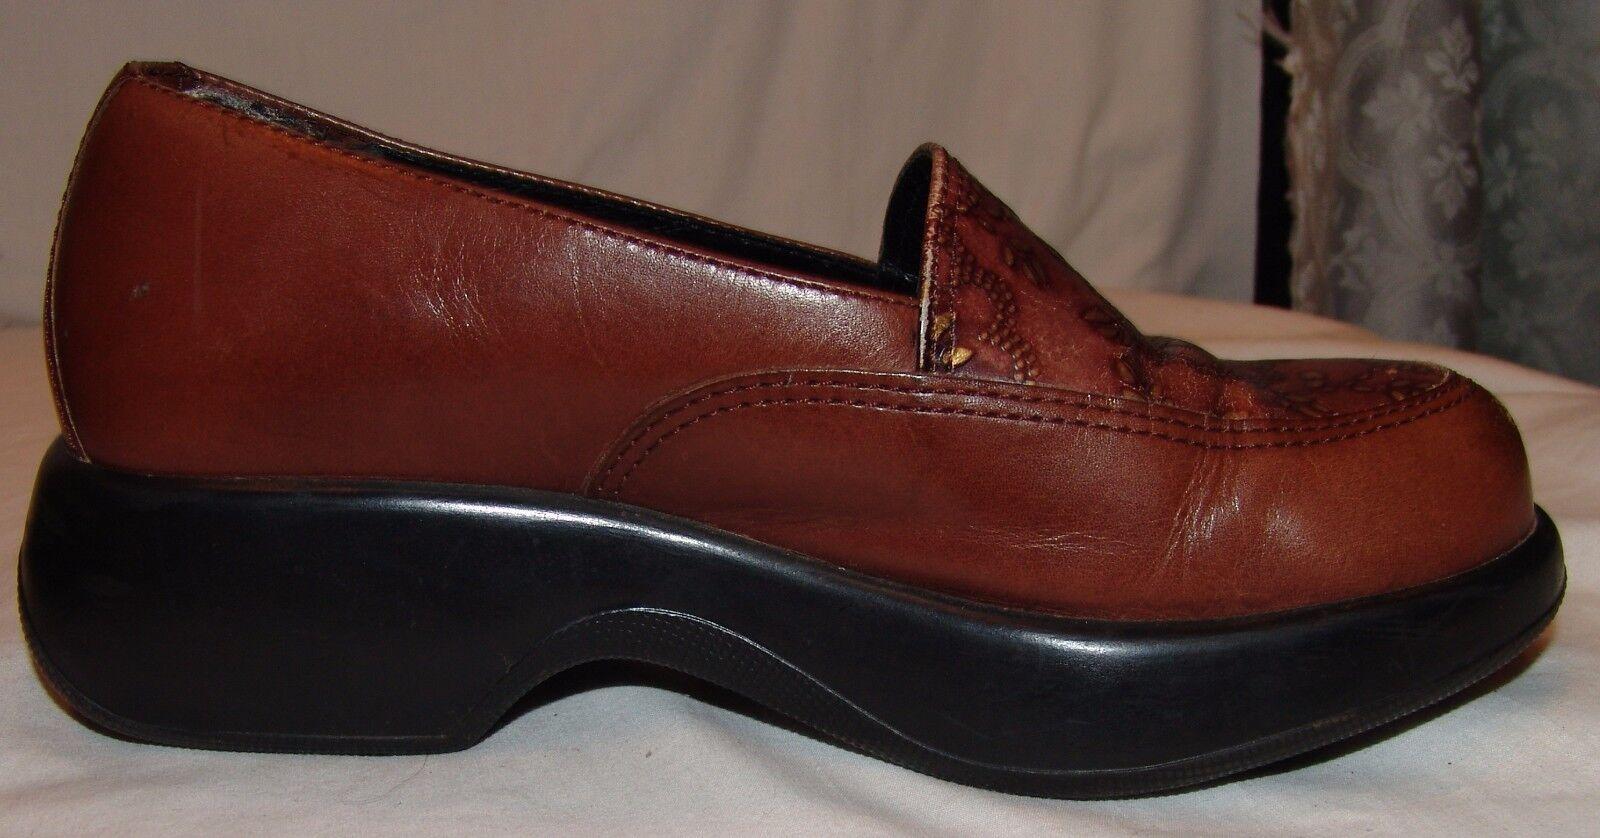 Dansko Brown Leather shoes Clogs 37 Embossed Flowers 6.5 6.5 6.5 7 Floral Nurse Uniform 0a79ea